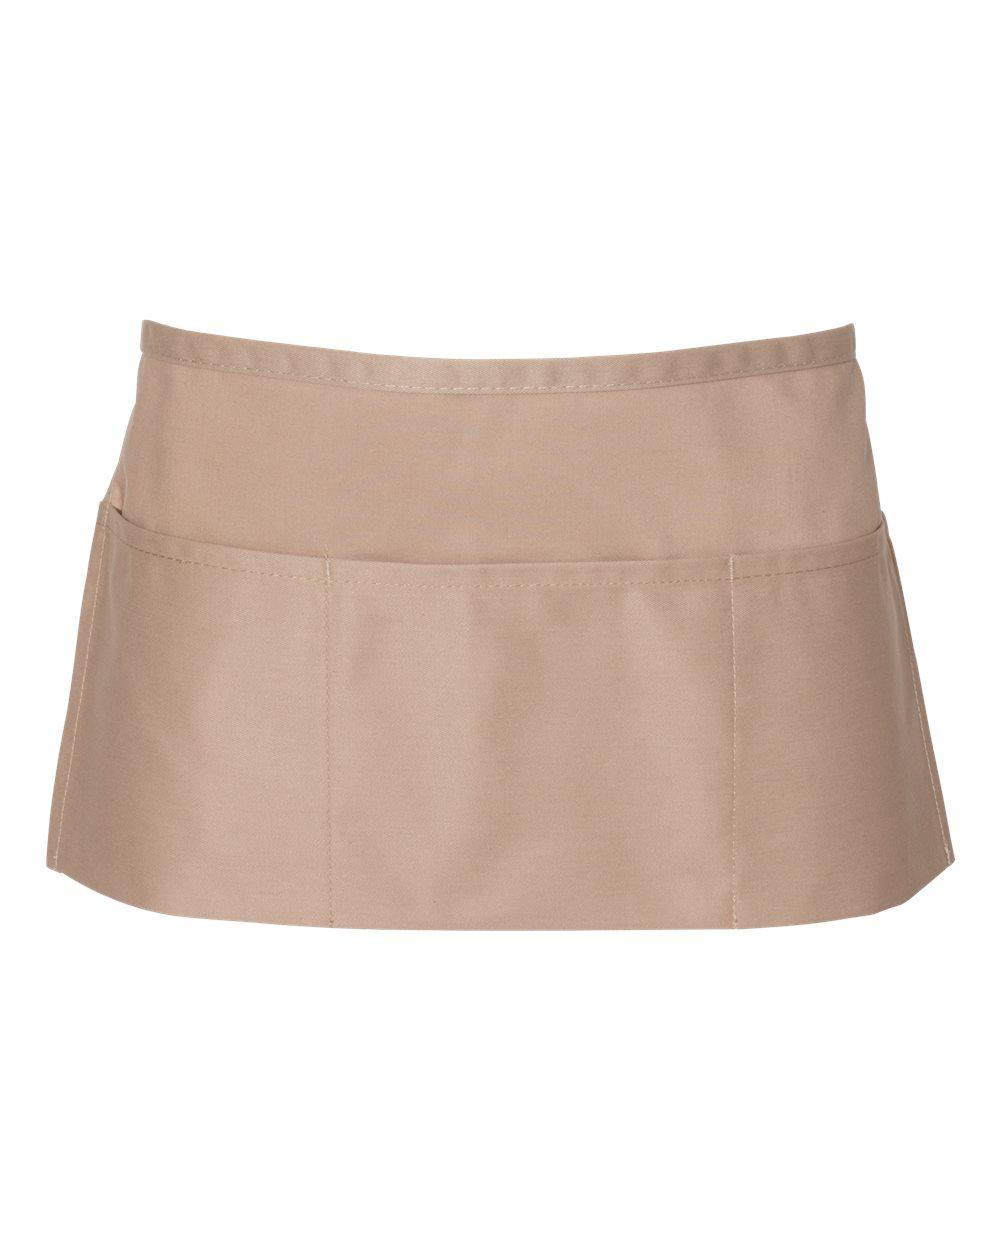 Waist Apron Liberty Bags 5501